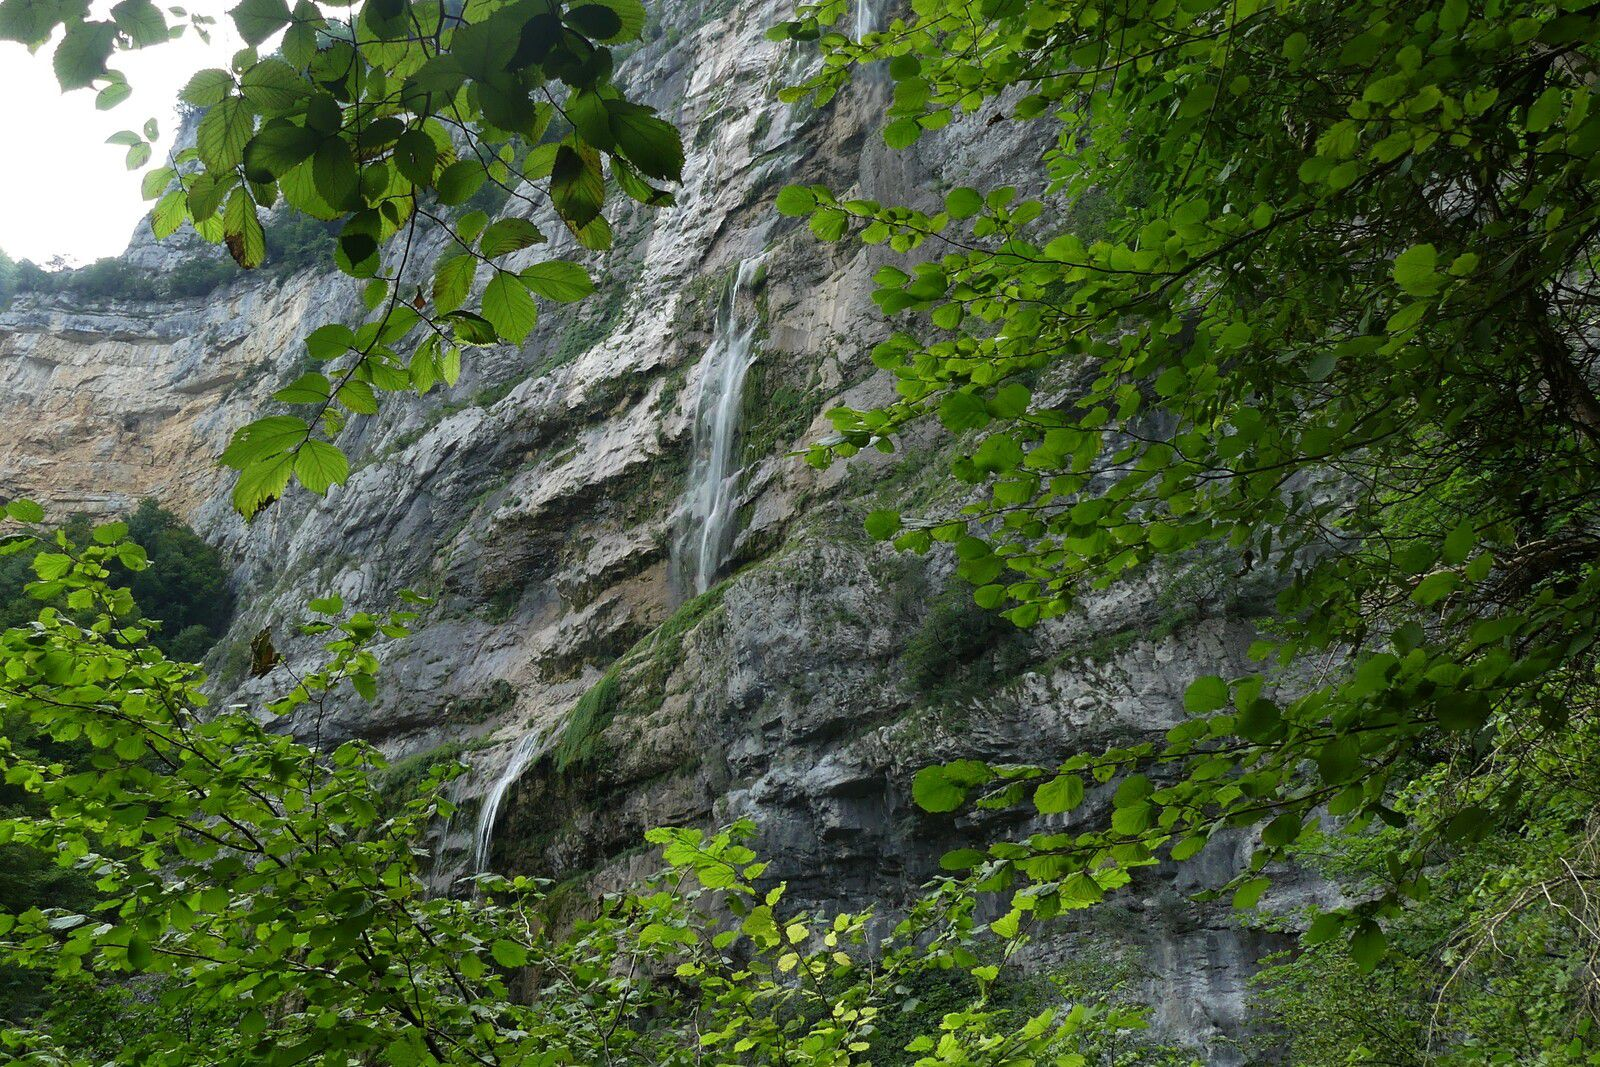 Grotte du Bournillon